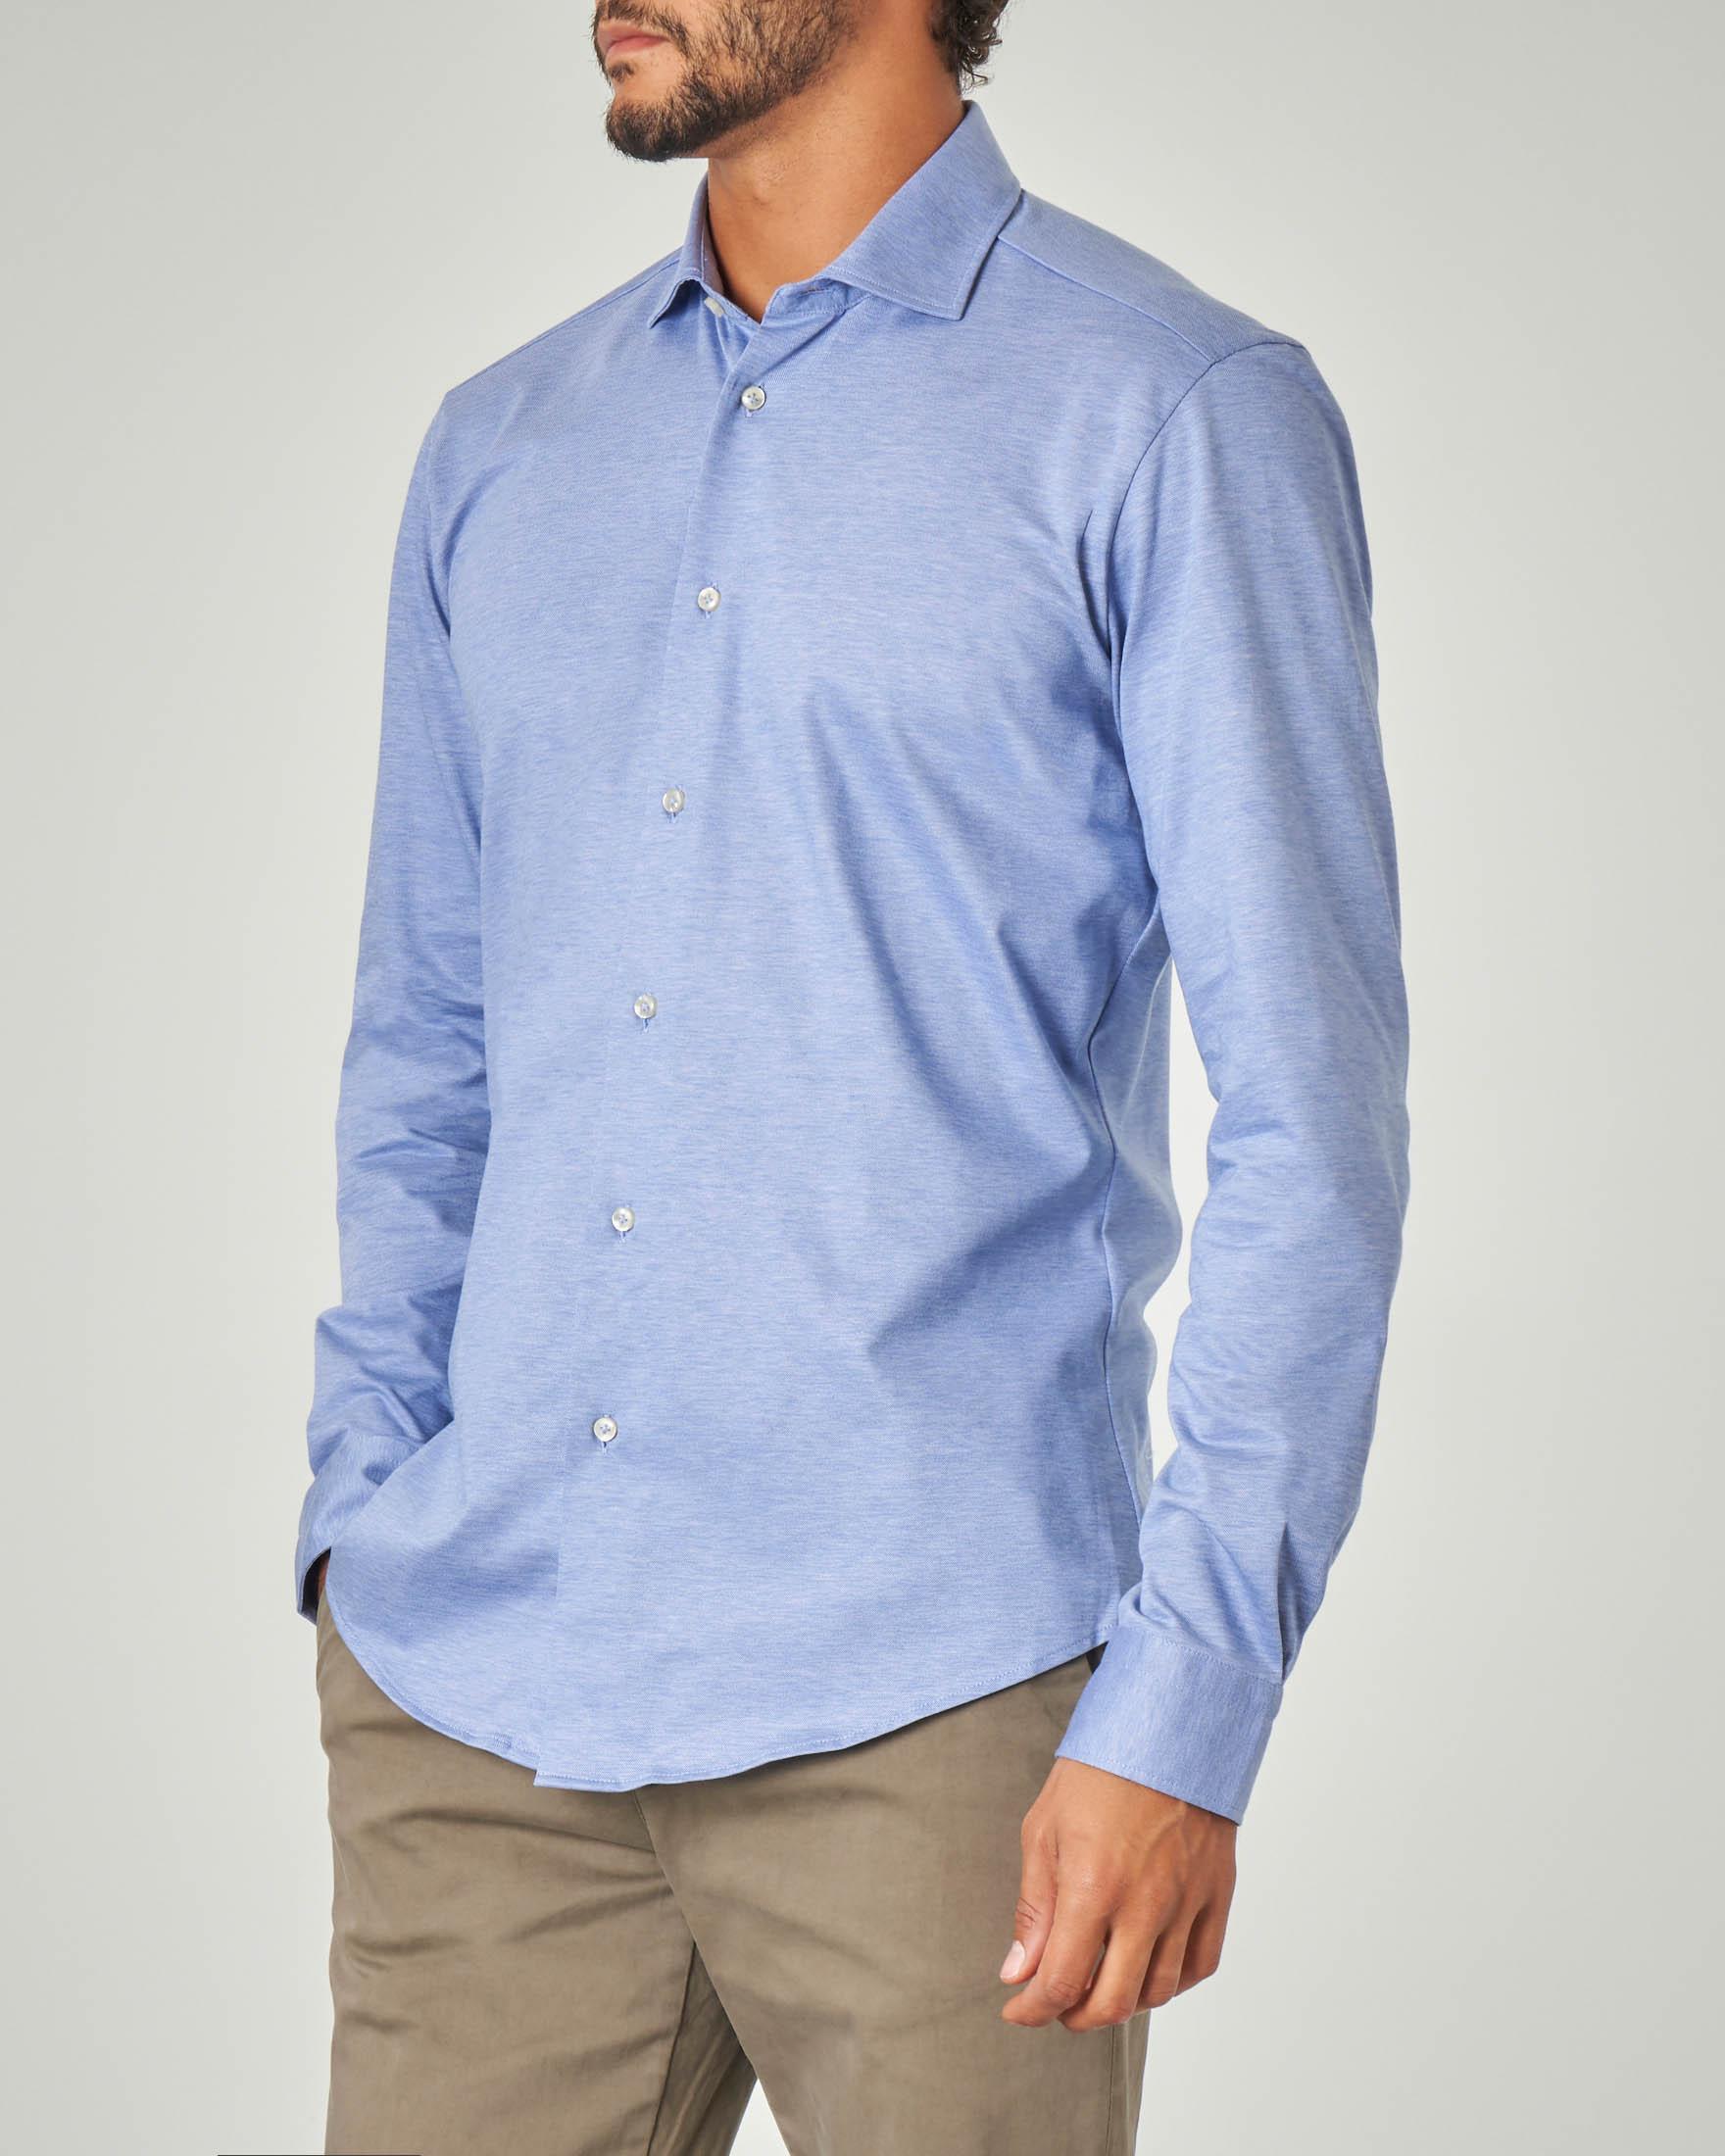 Camicia azzurra in jersey di cotone